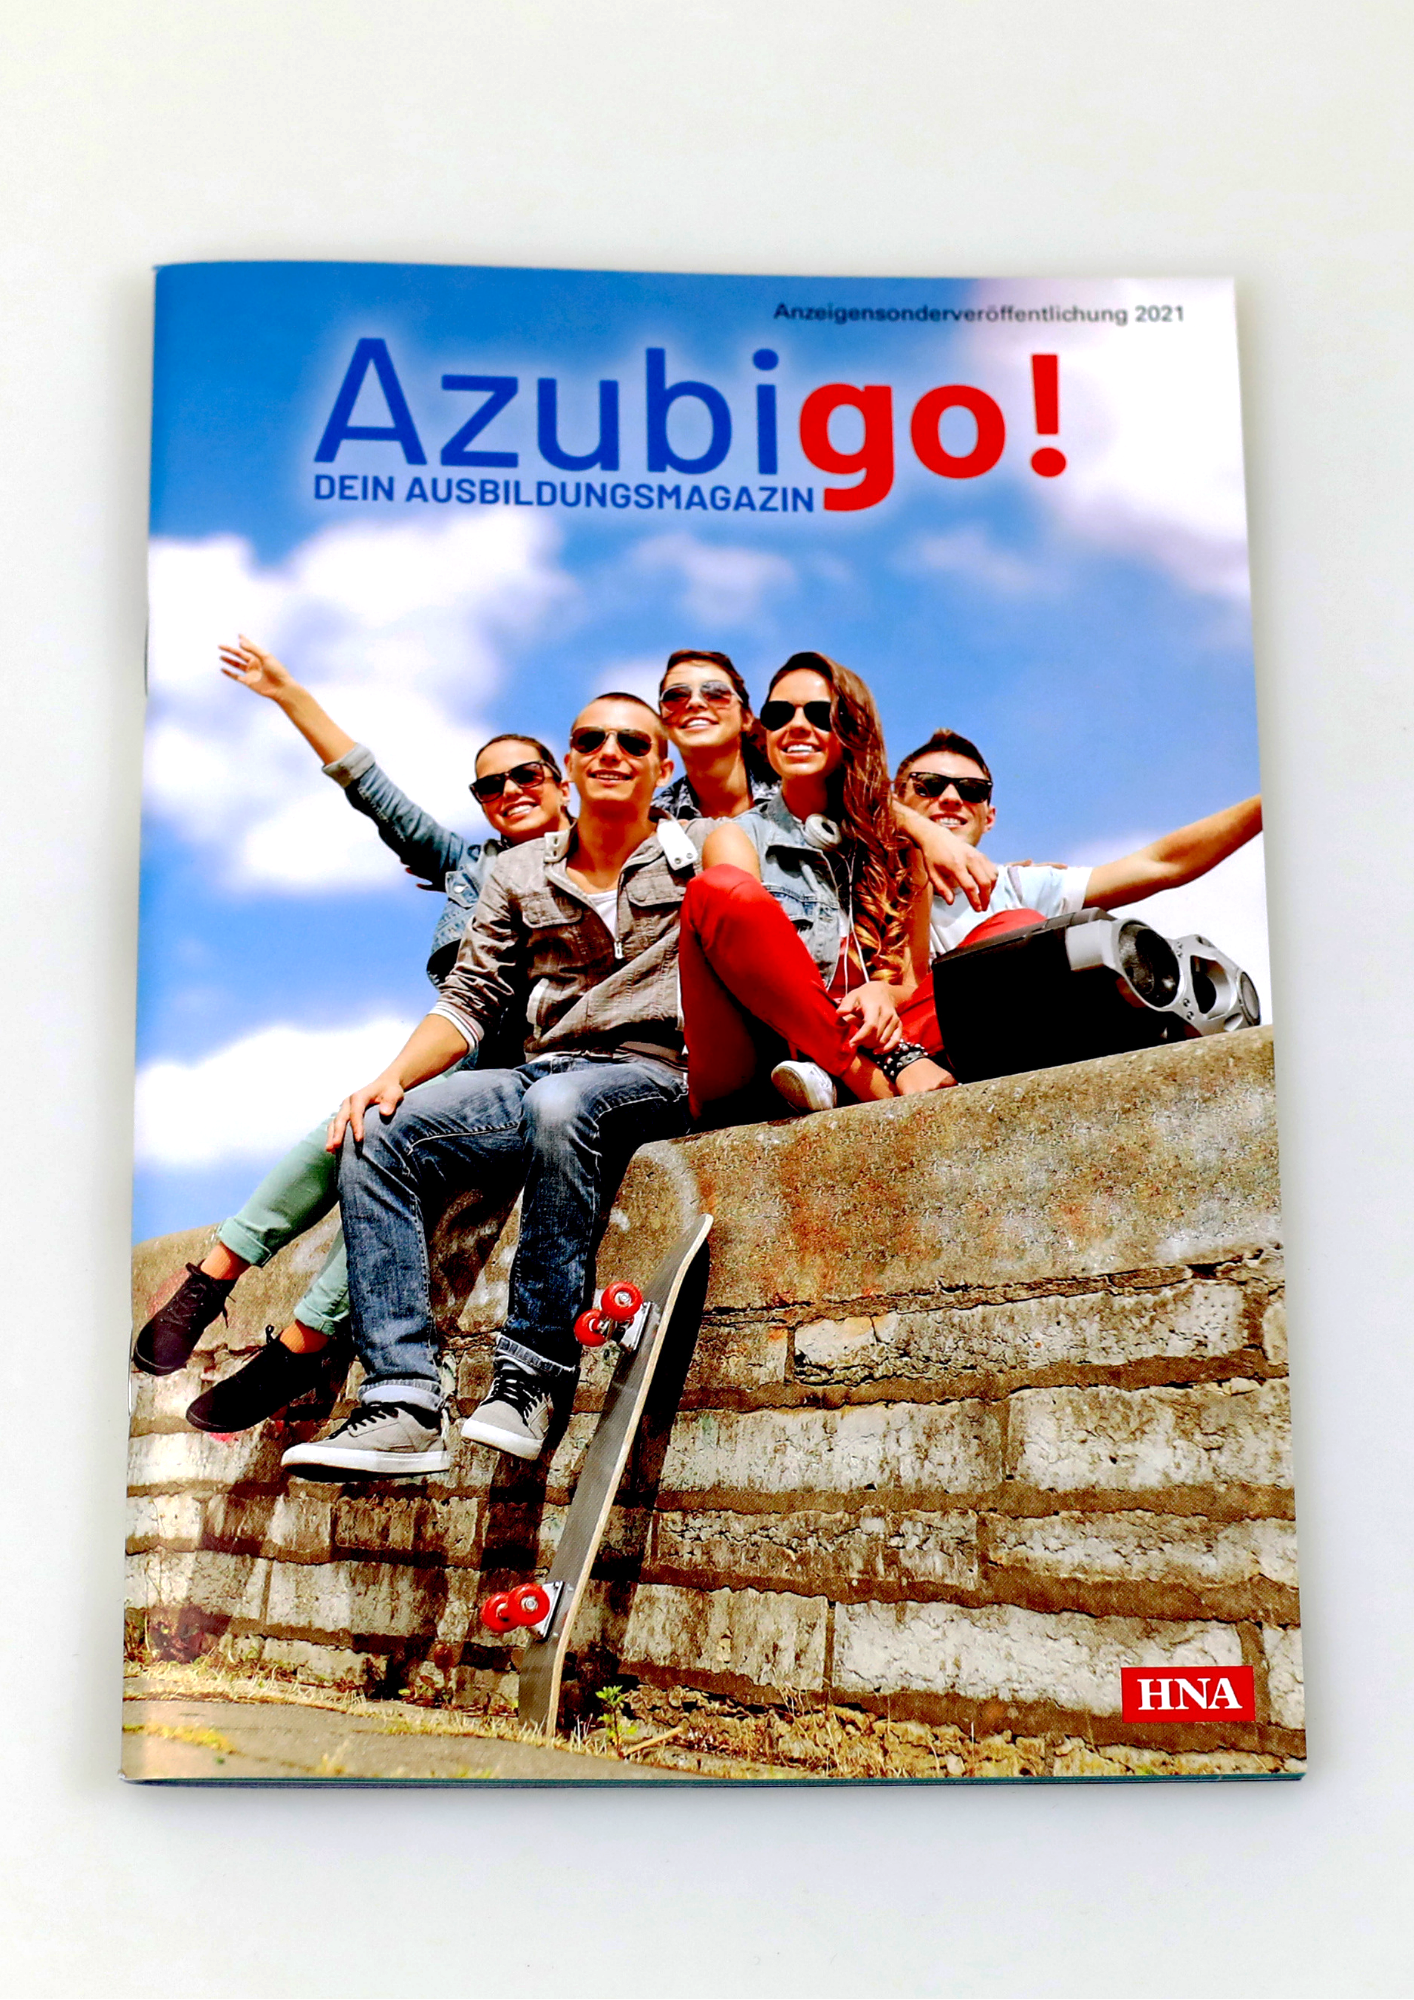 Azubi Go hochformatig